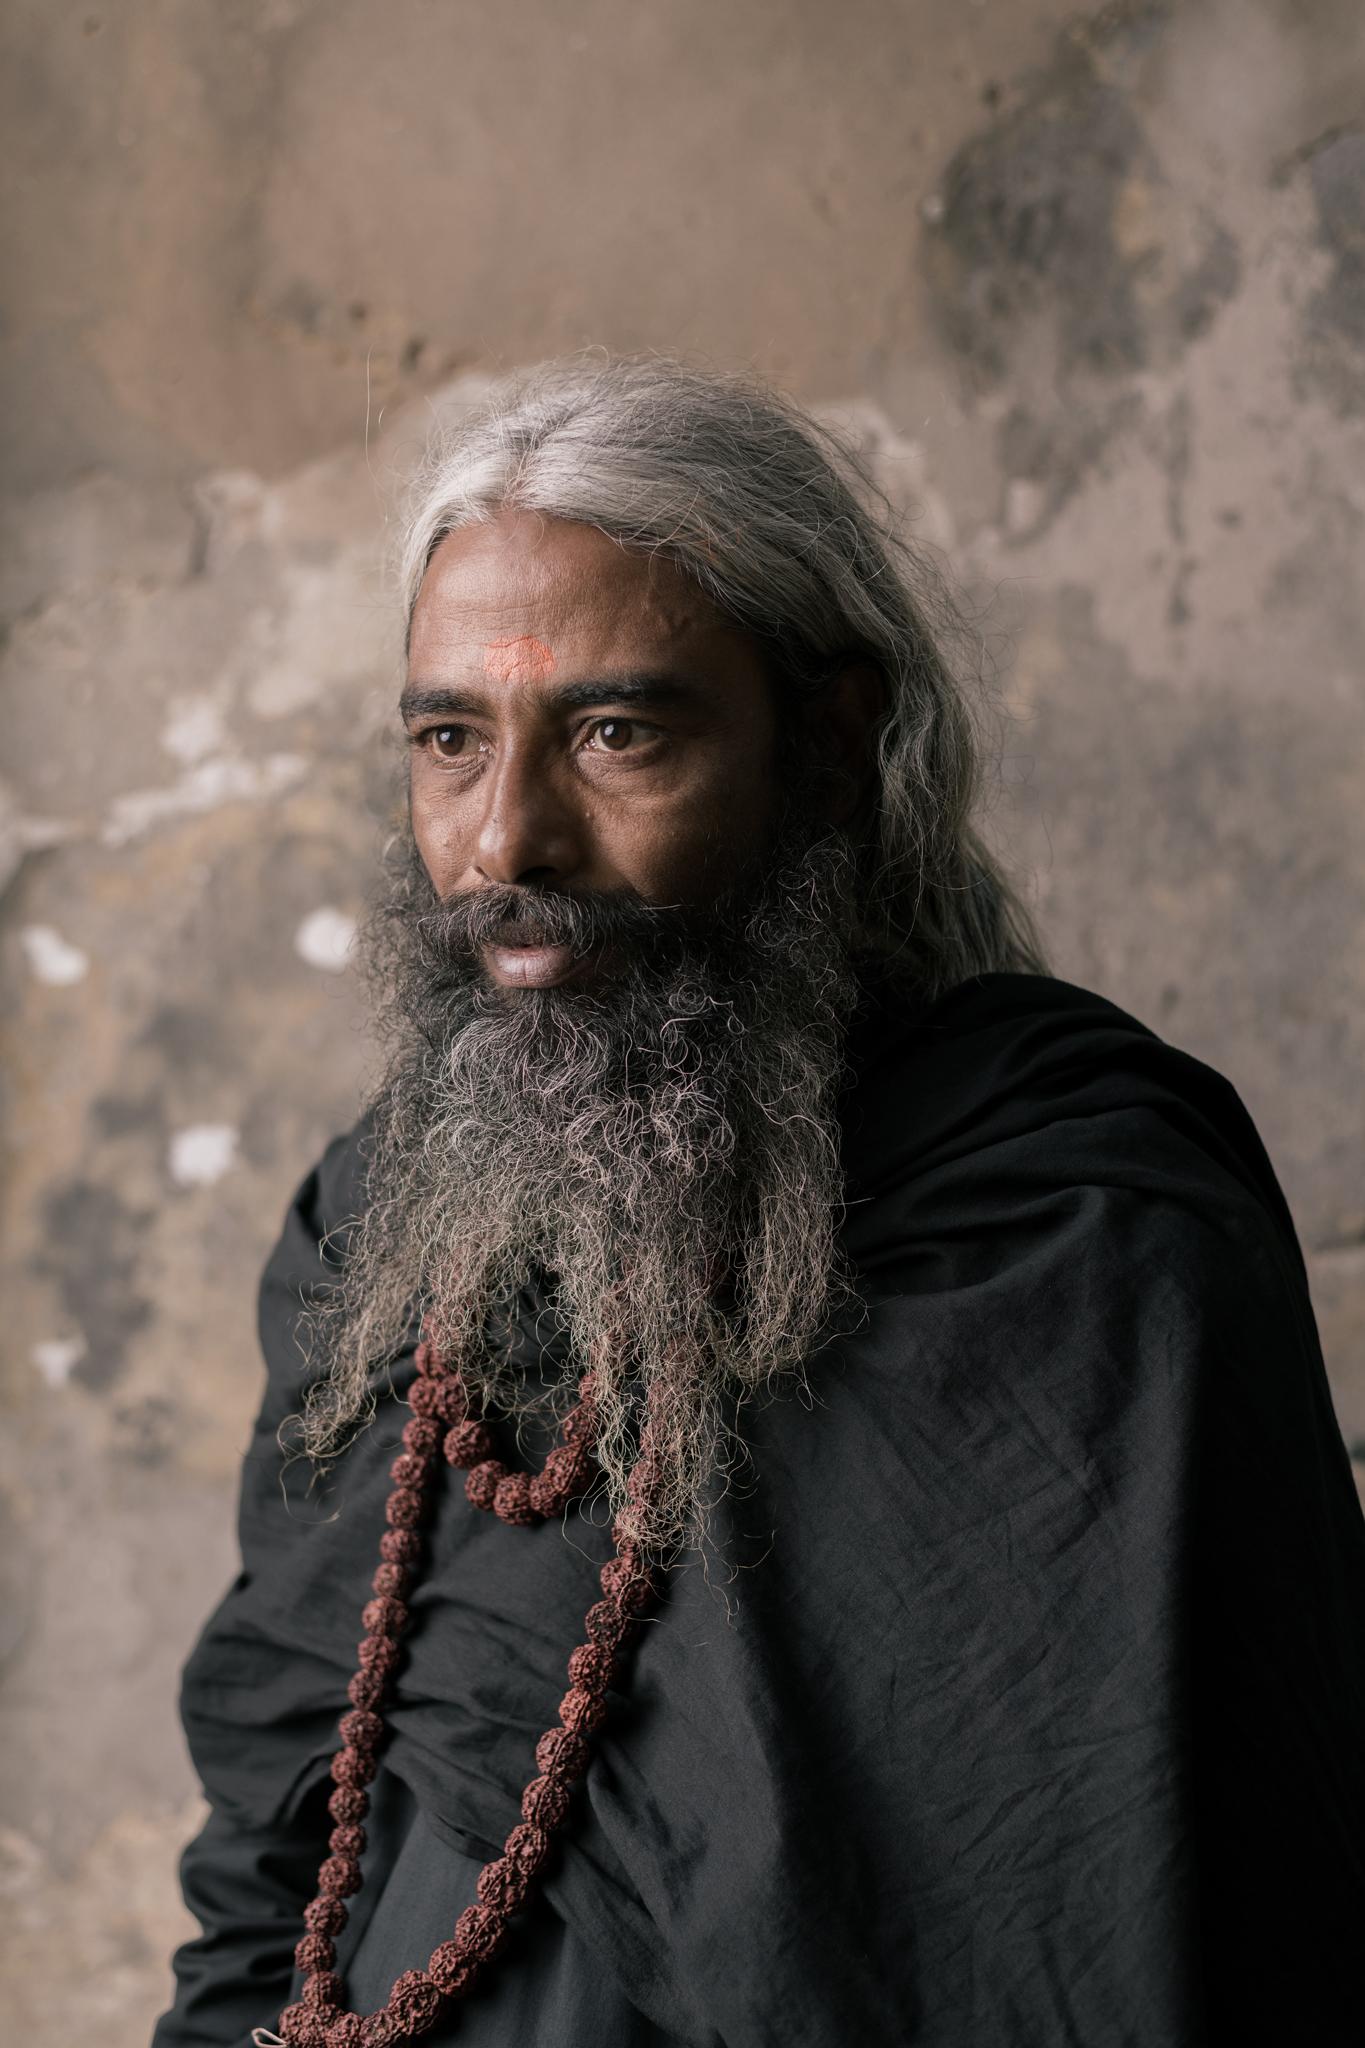 Varanasi_portrait_travel_photography_Manchester_Adventure_Photographer_Jan_Bella16.jpg